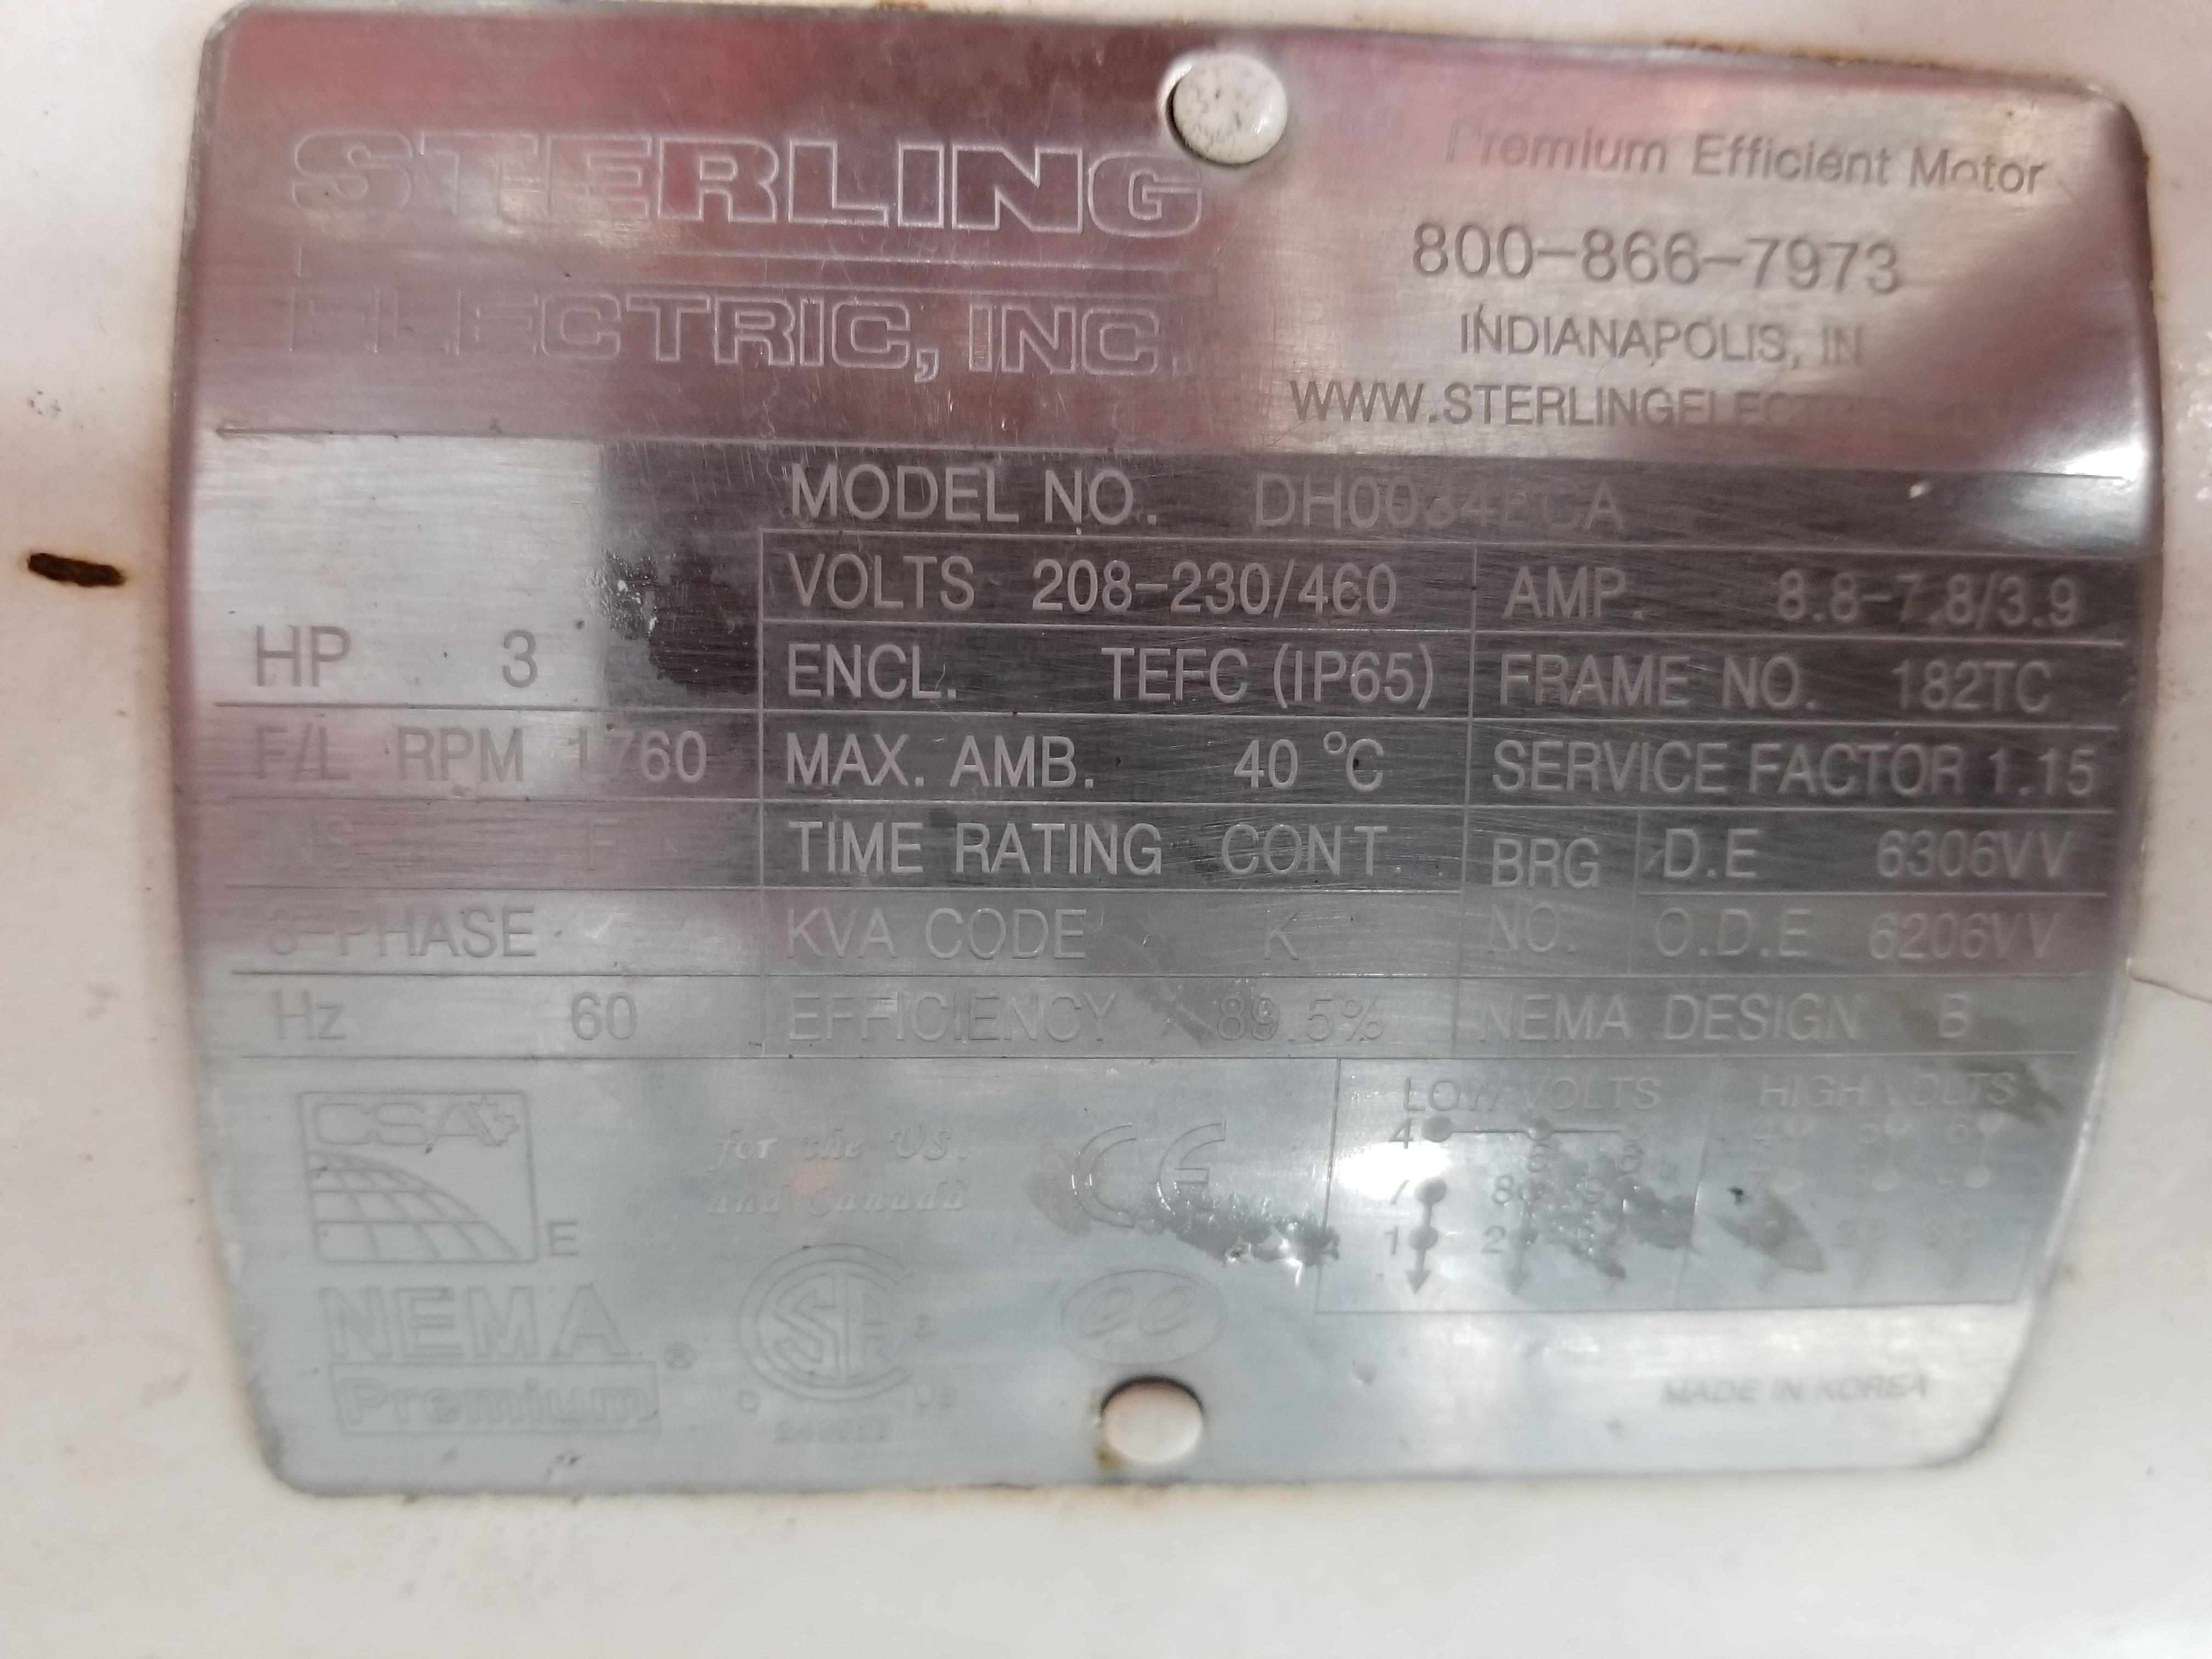 2015 Alfa Laval Positive Displacement Pump - Image 6 of 6